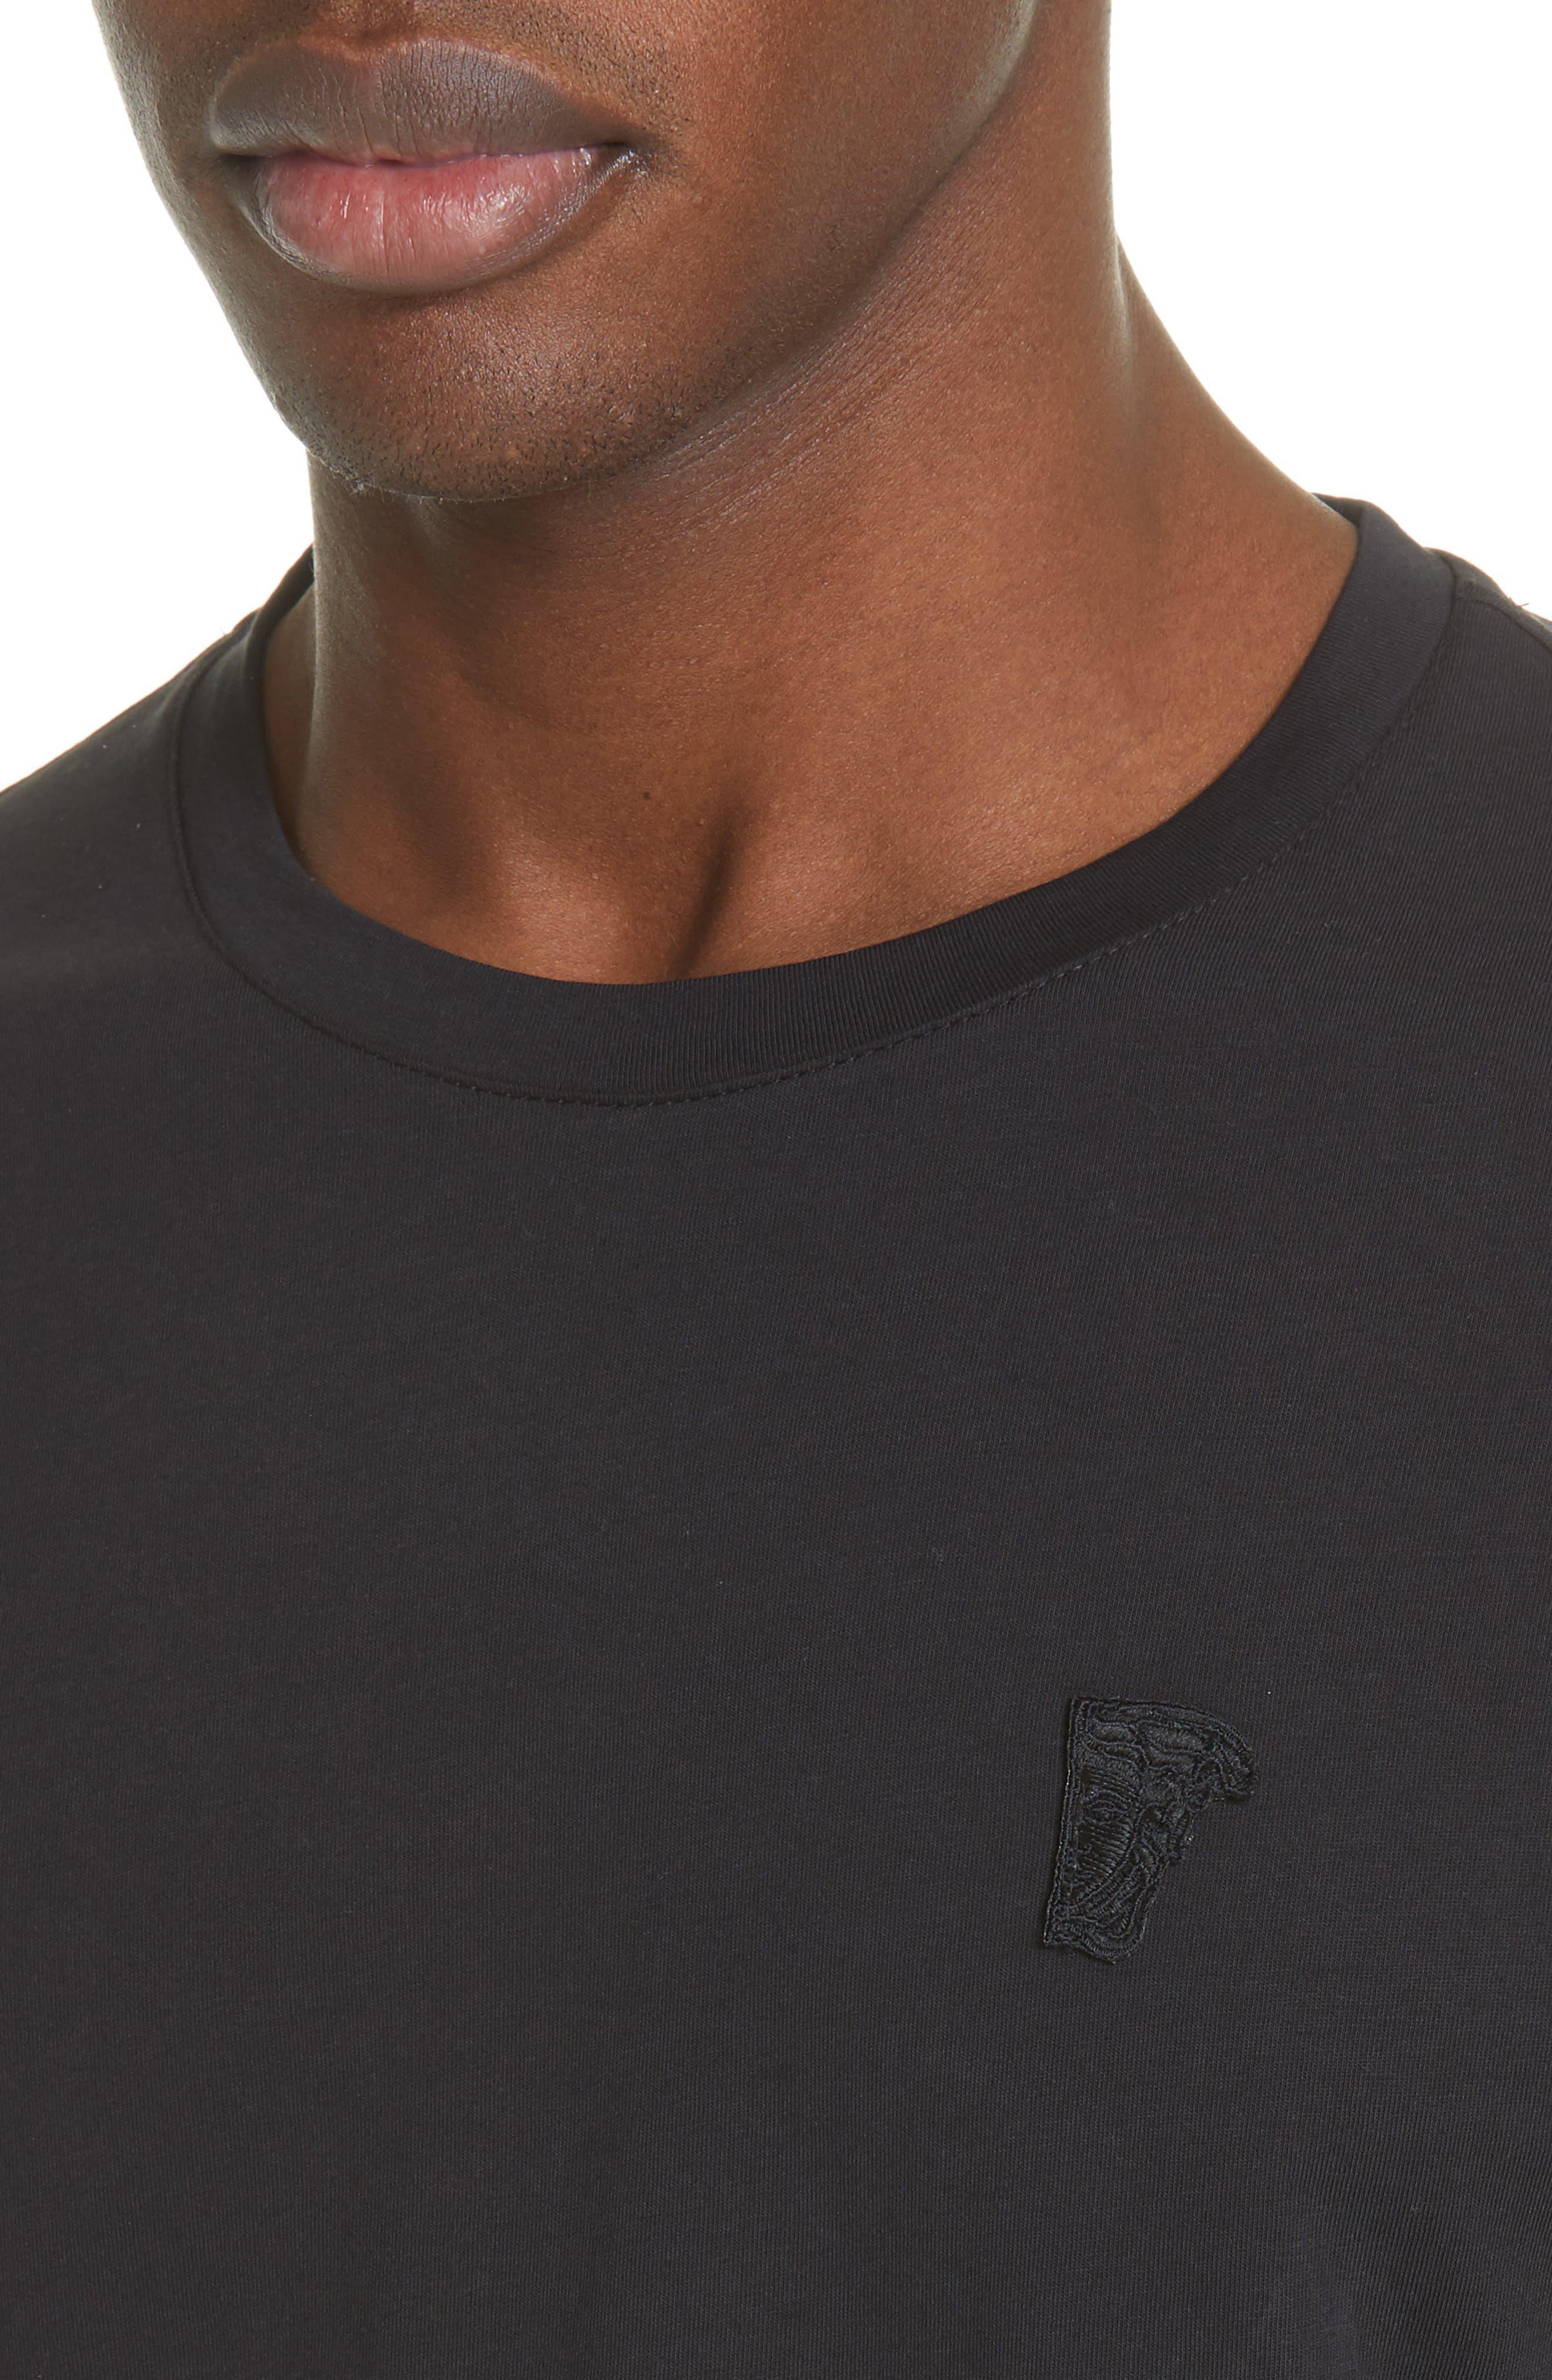 VERSACE COLLECTION,                             Medusa Long Sleeve T-Shirt,                             Alternate thumbnail 4, color,                             BLACK